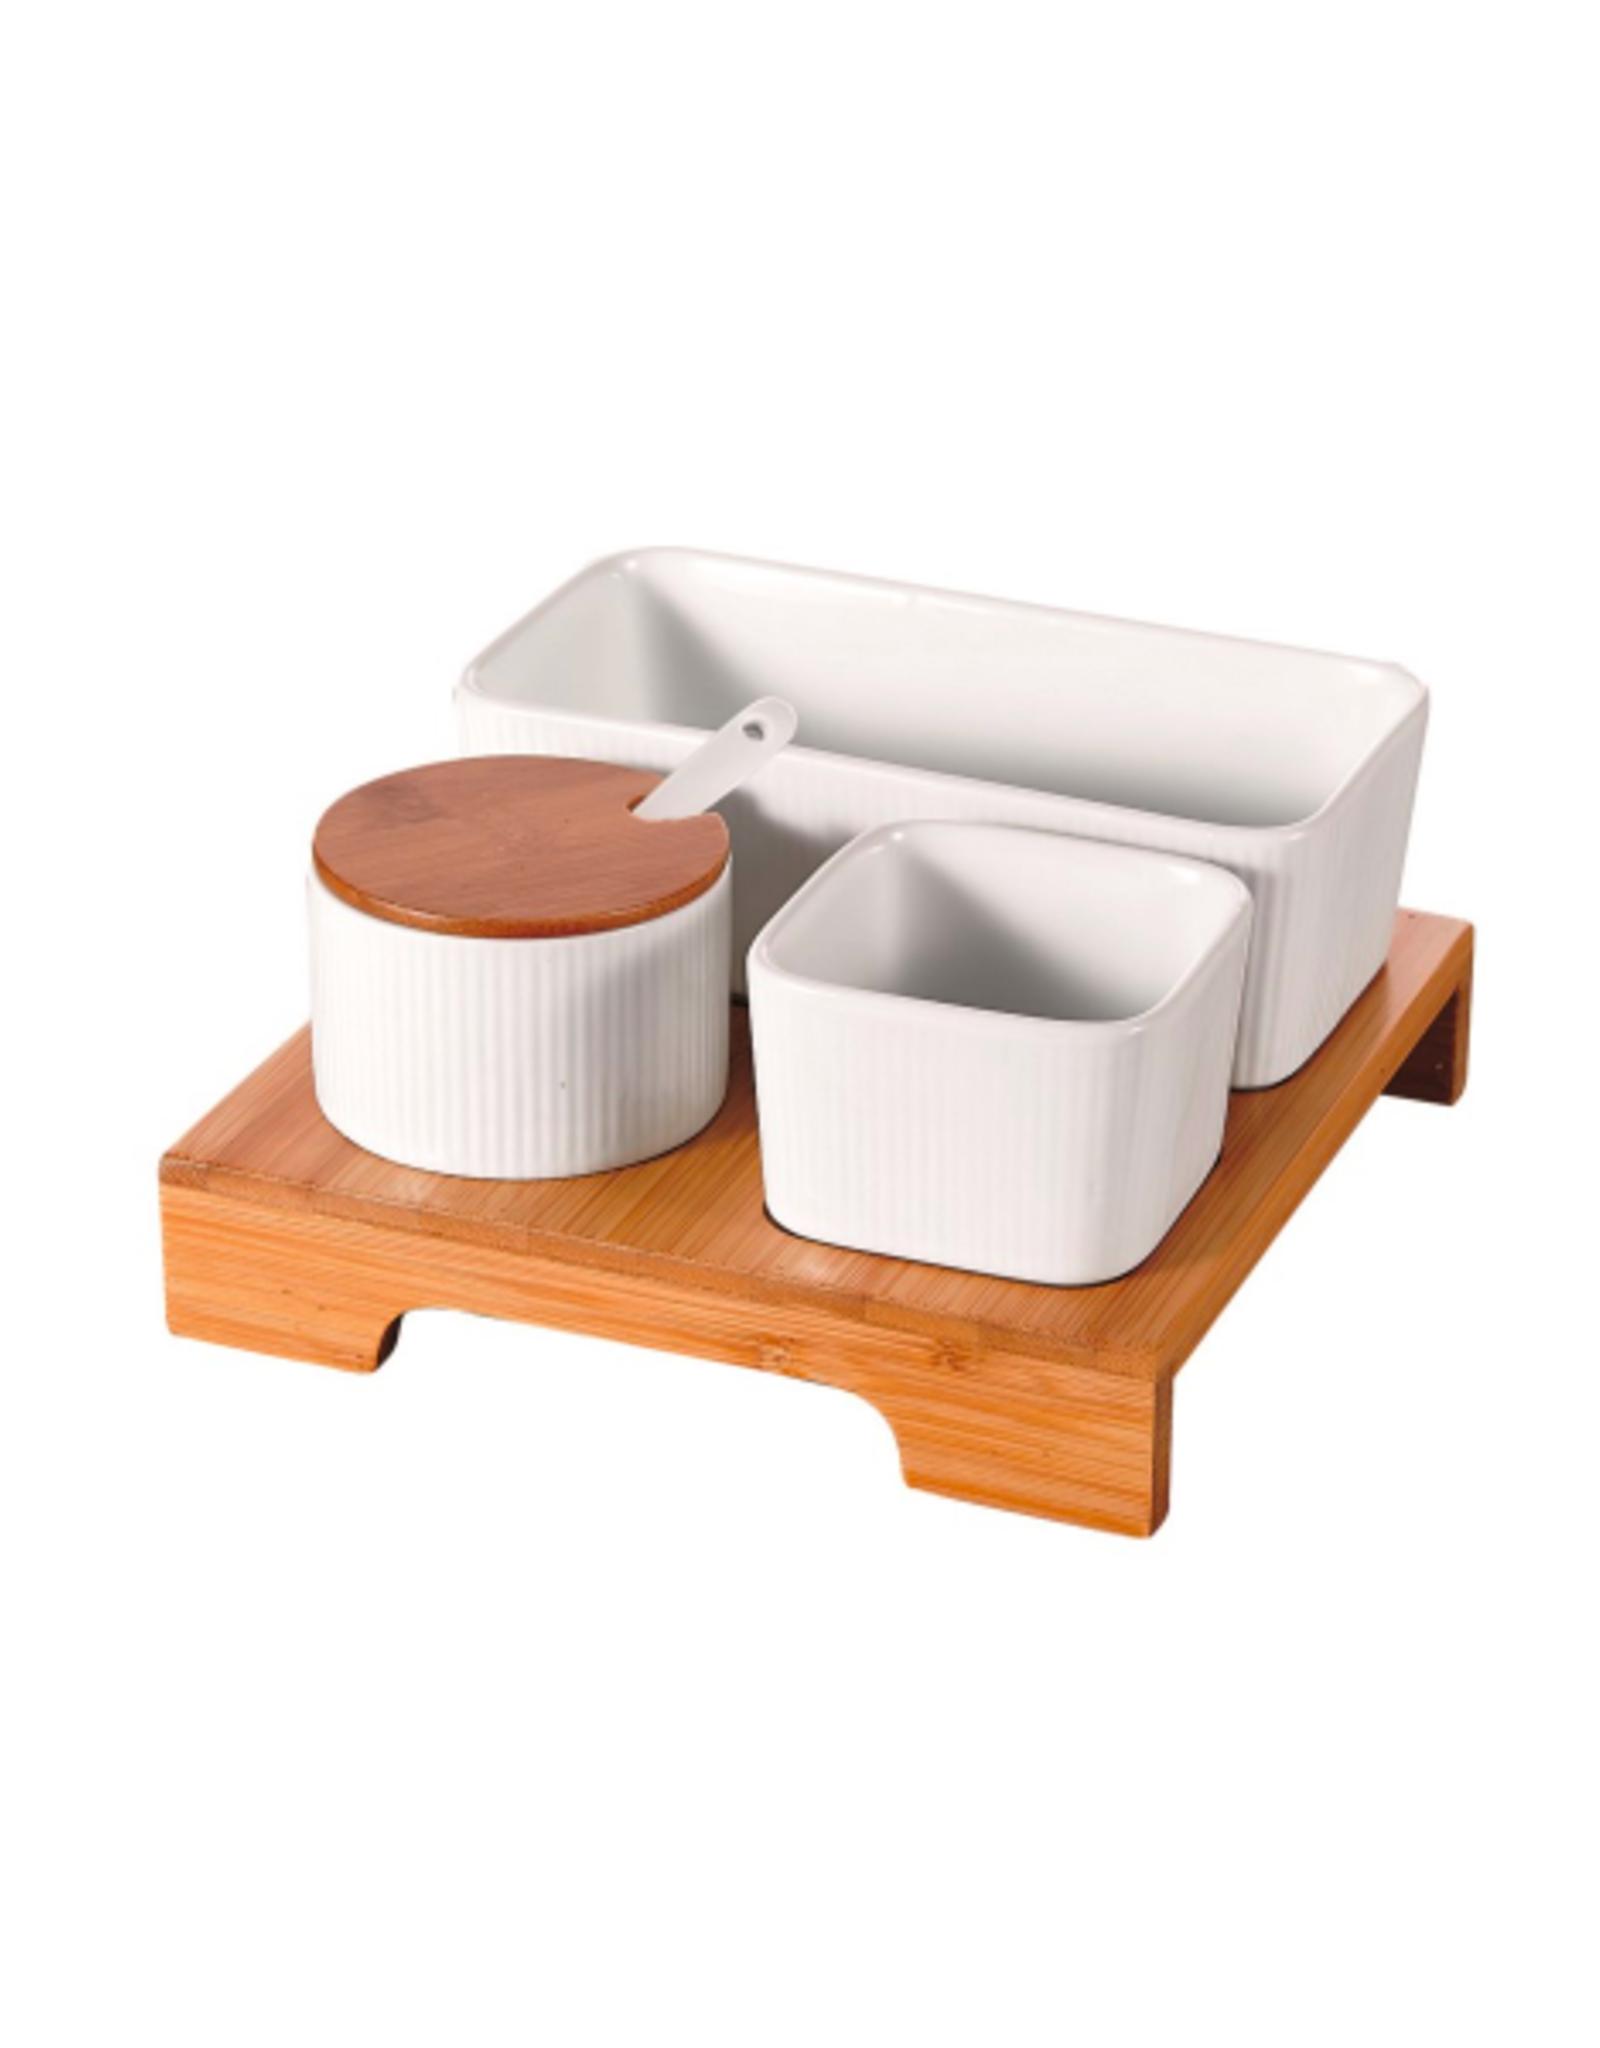 NIA - Minimal Serving/ Condiment Set